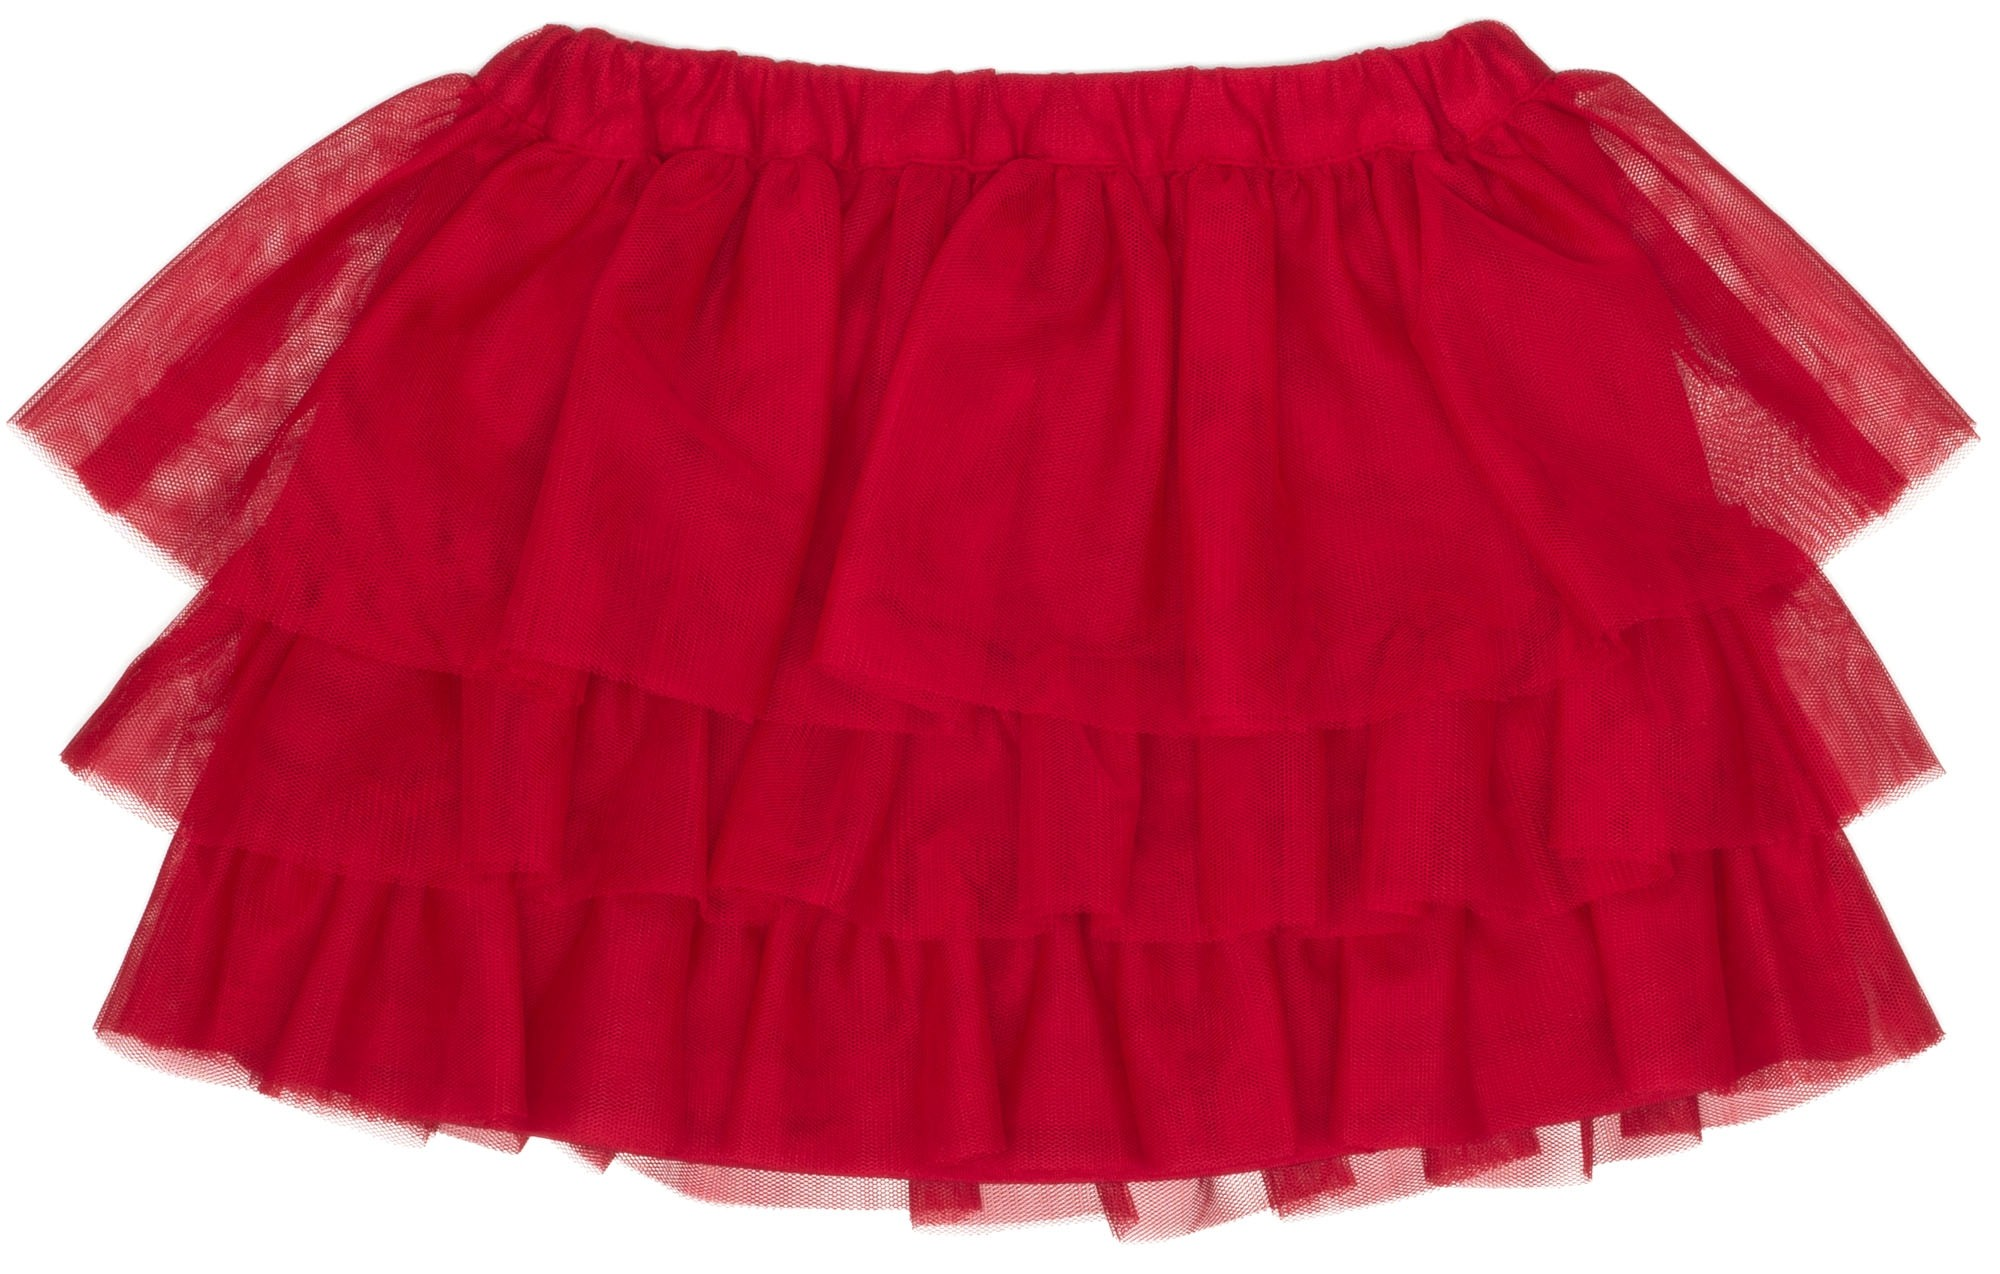 Юбки Barkito Юбка Рок-н-ролл Barkito красный юбка alina assi цвет красный